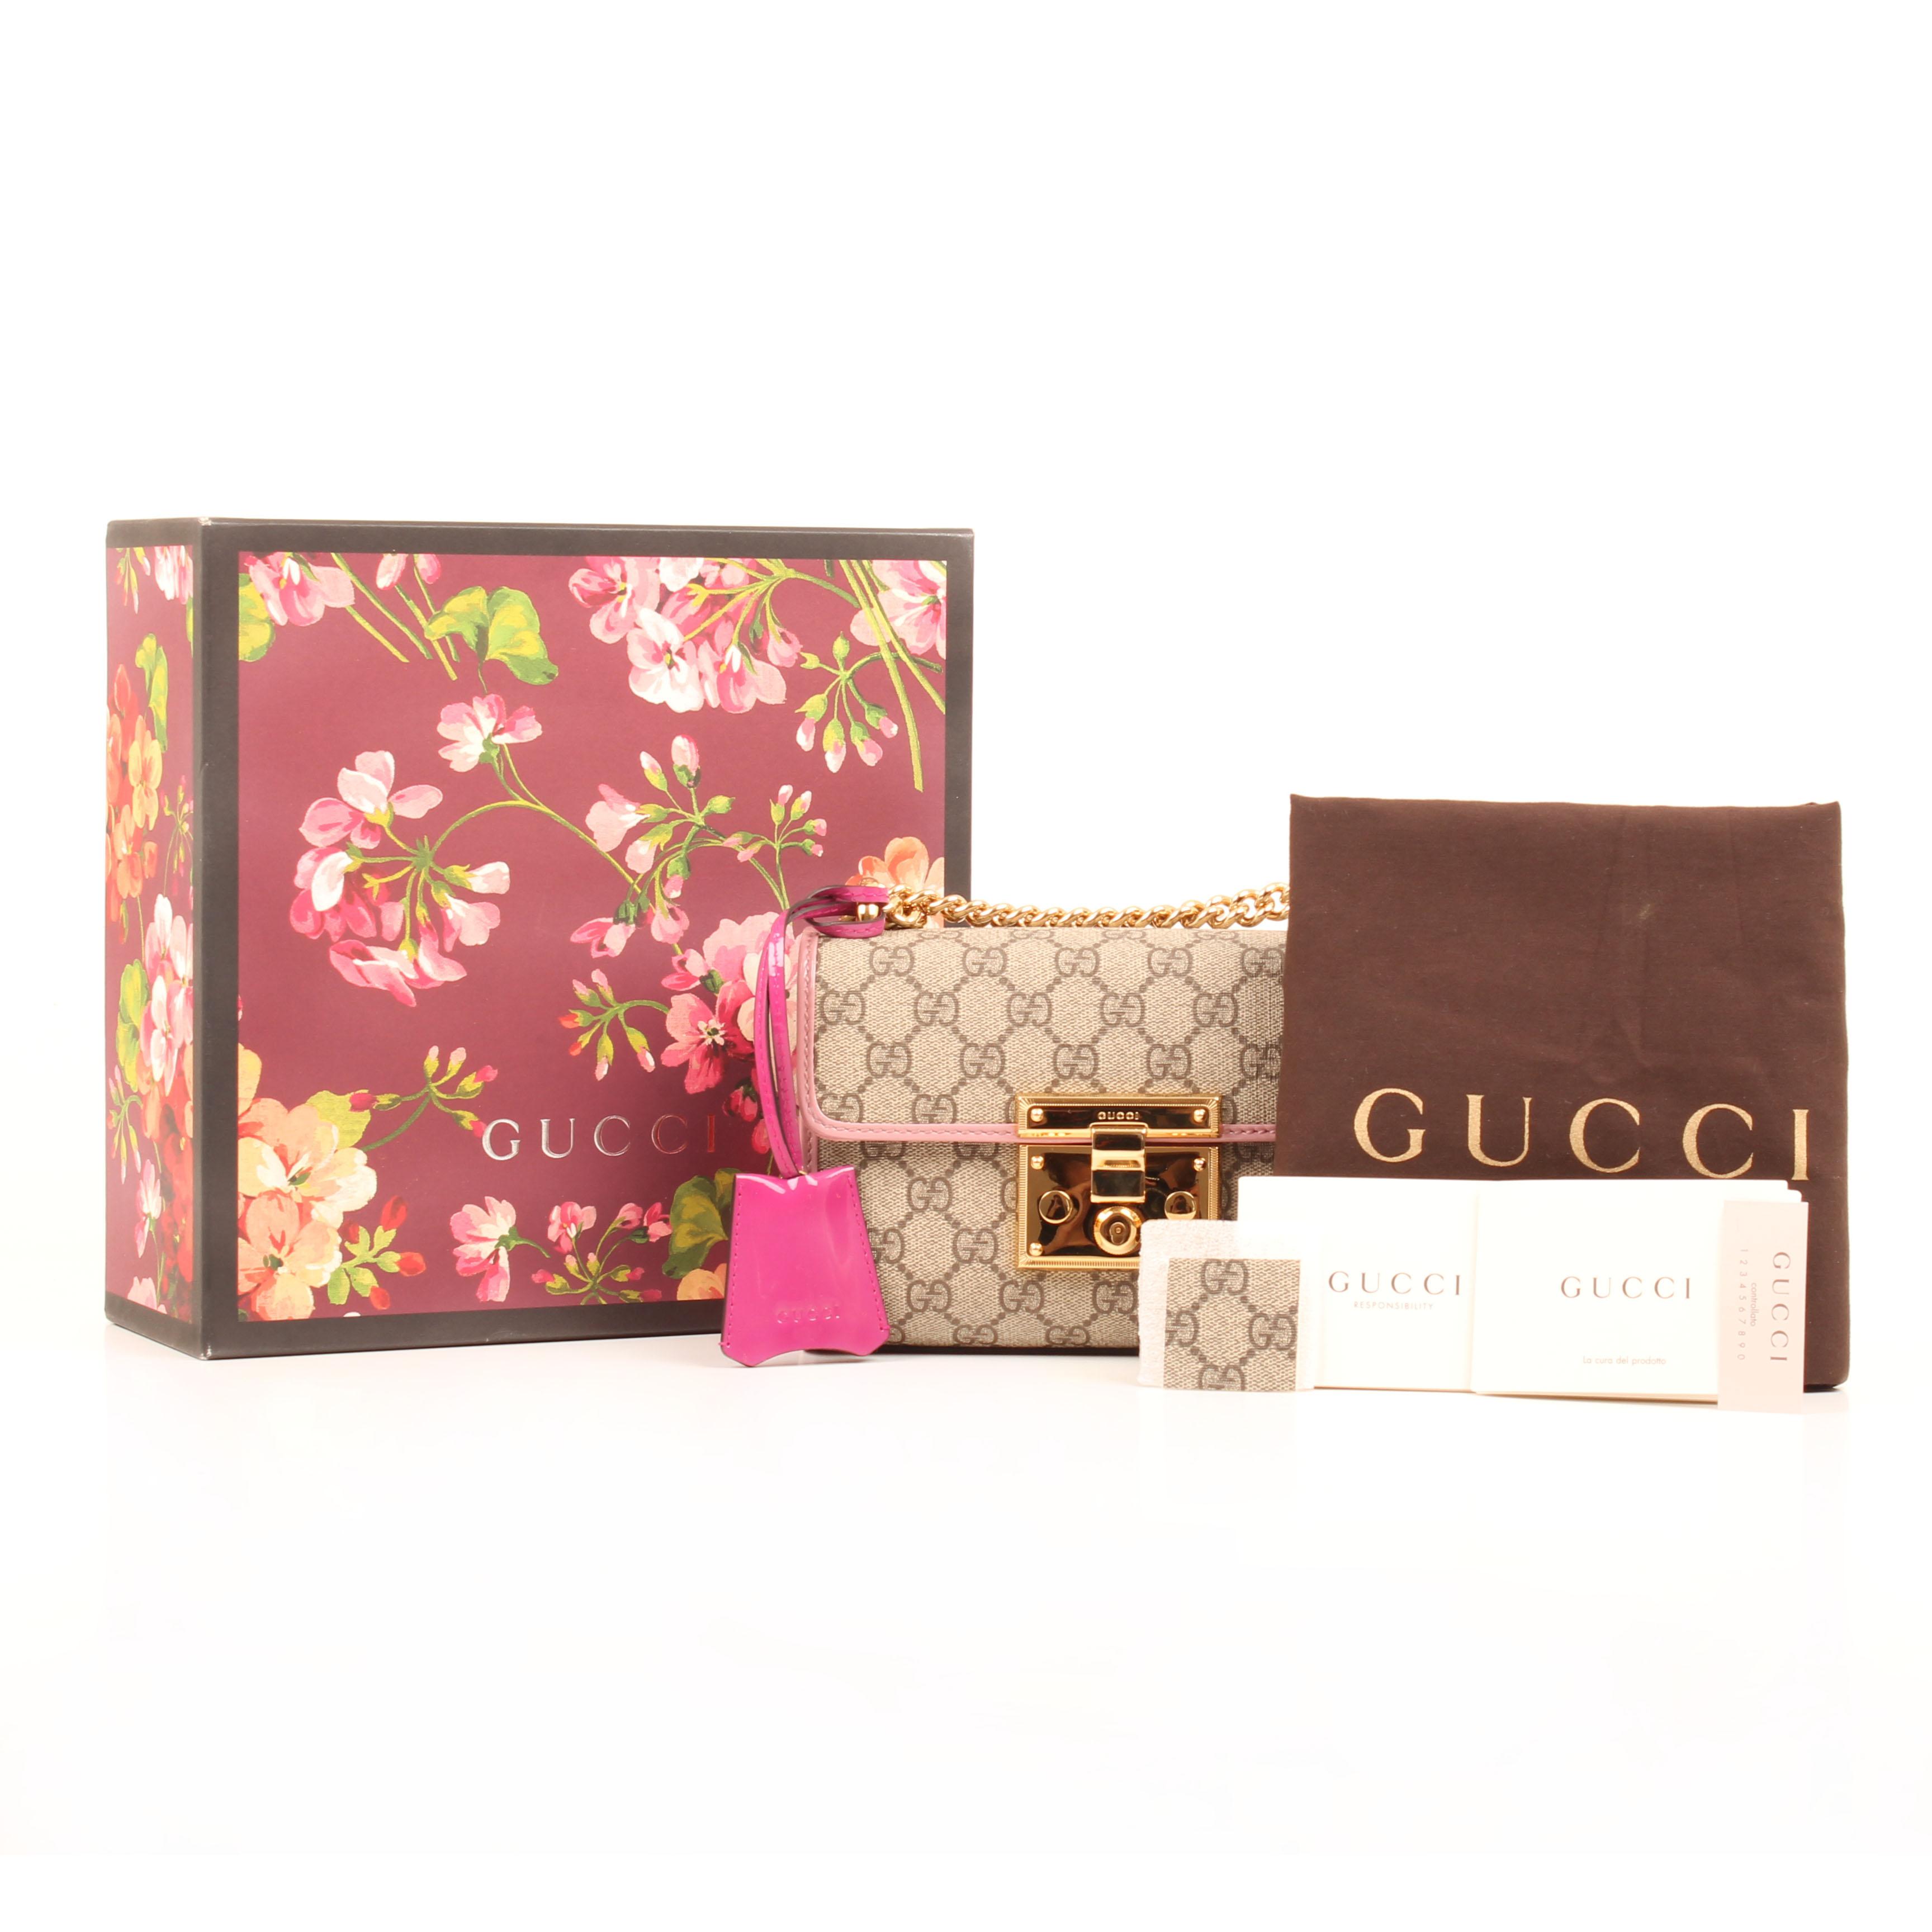 gucci padlock bag gg supreme canvas patent box dustbag